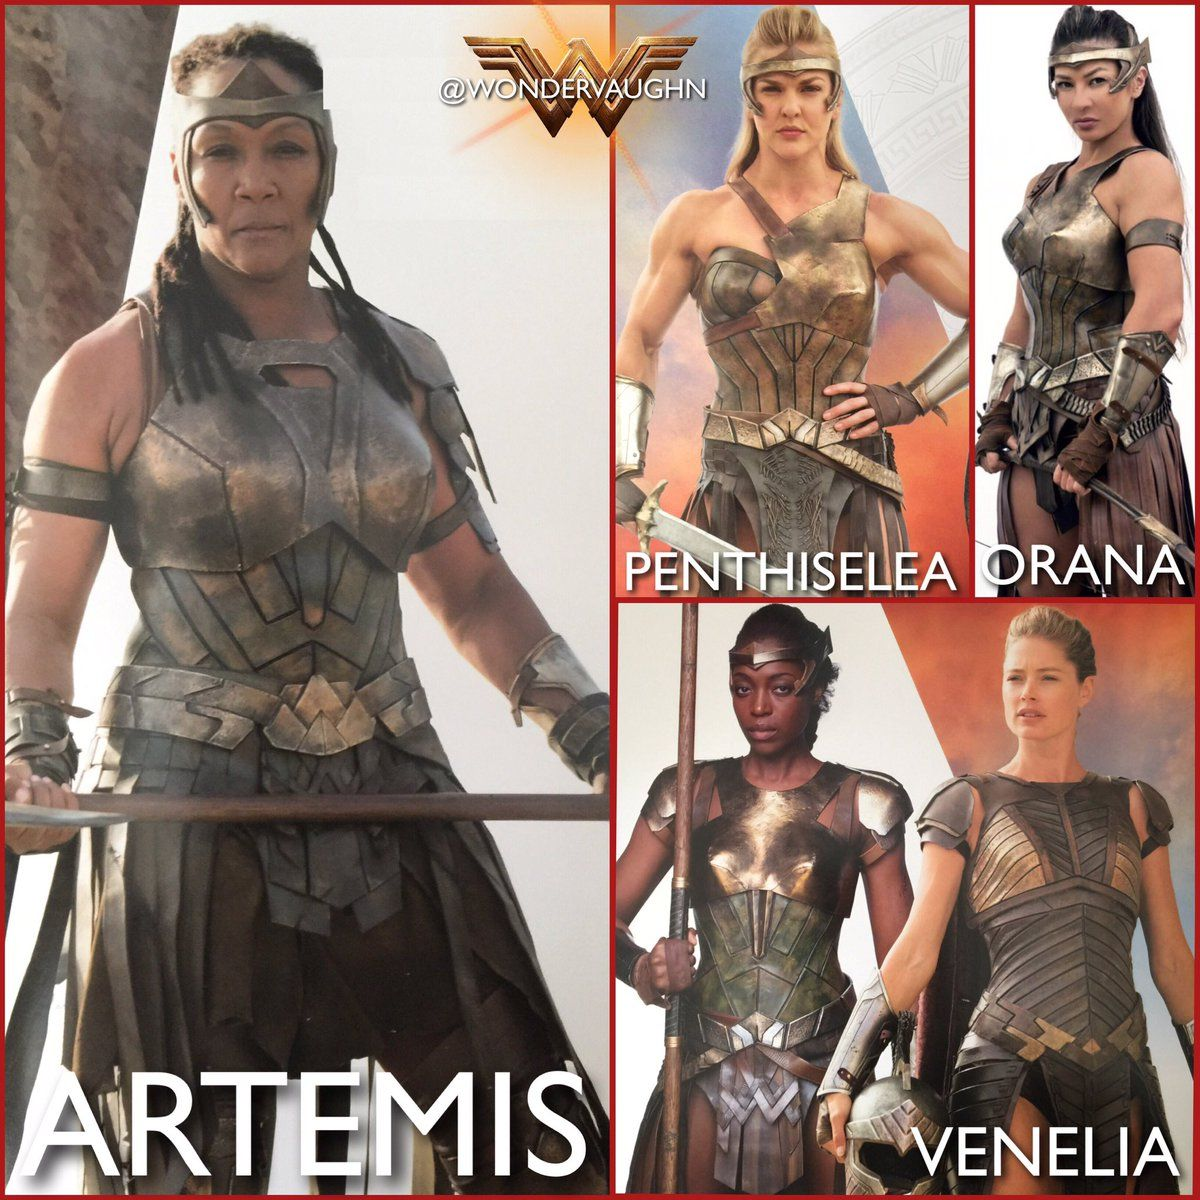 Vaughn Mounsey Wondervaughn Twitter Amazons Wonder Woman Wonder Woman Movie Wonder Woman Cosplay